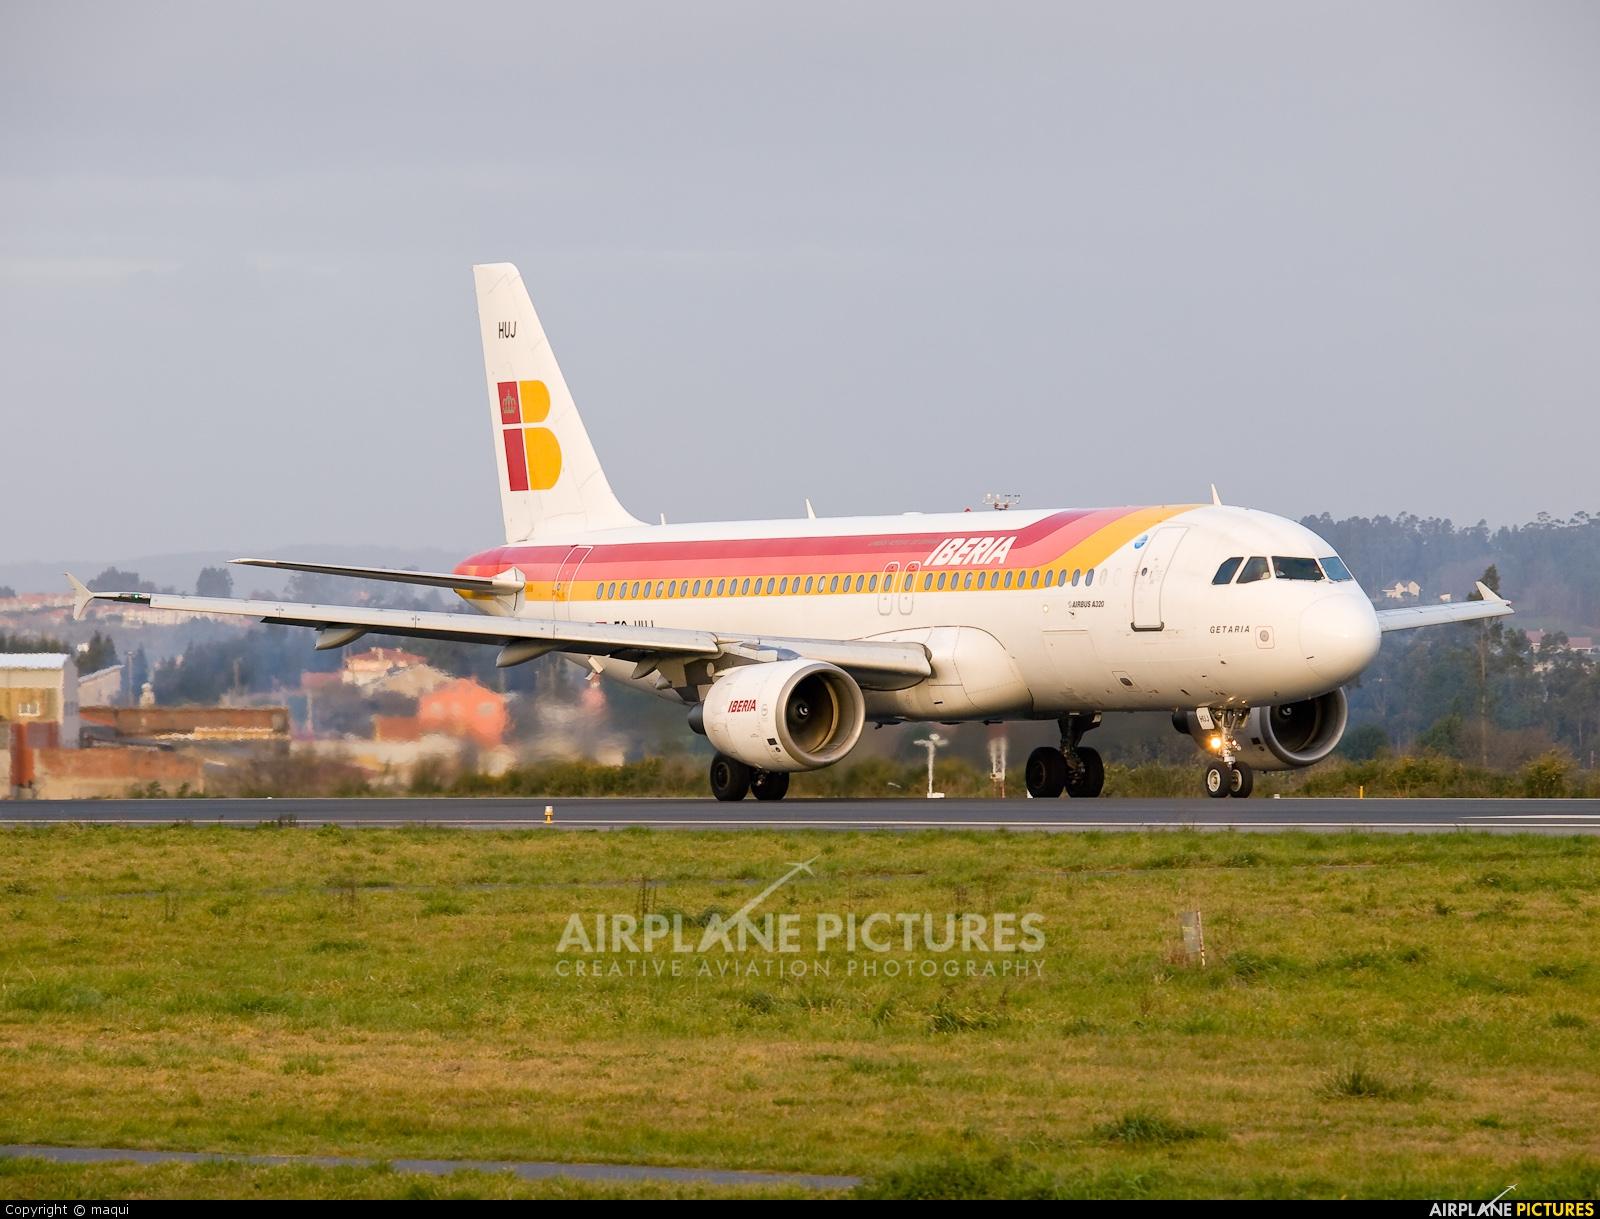 EC-HUJ - Iberia Airbus A320 at La Coruña | Photo ID 212978 ...